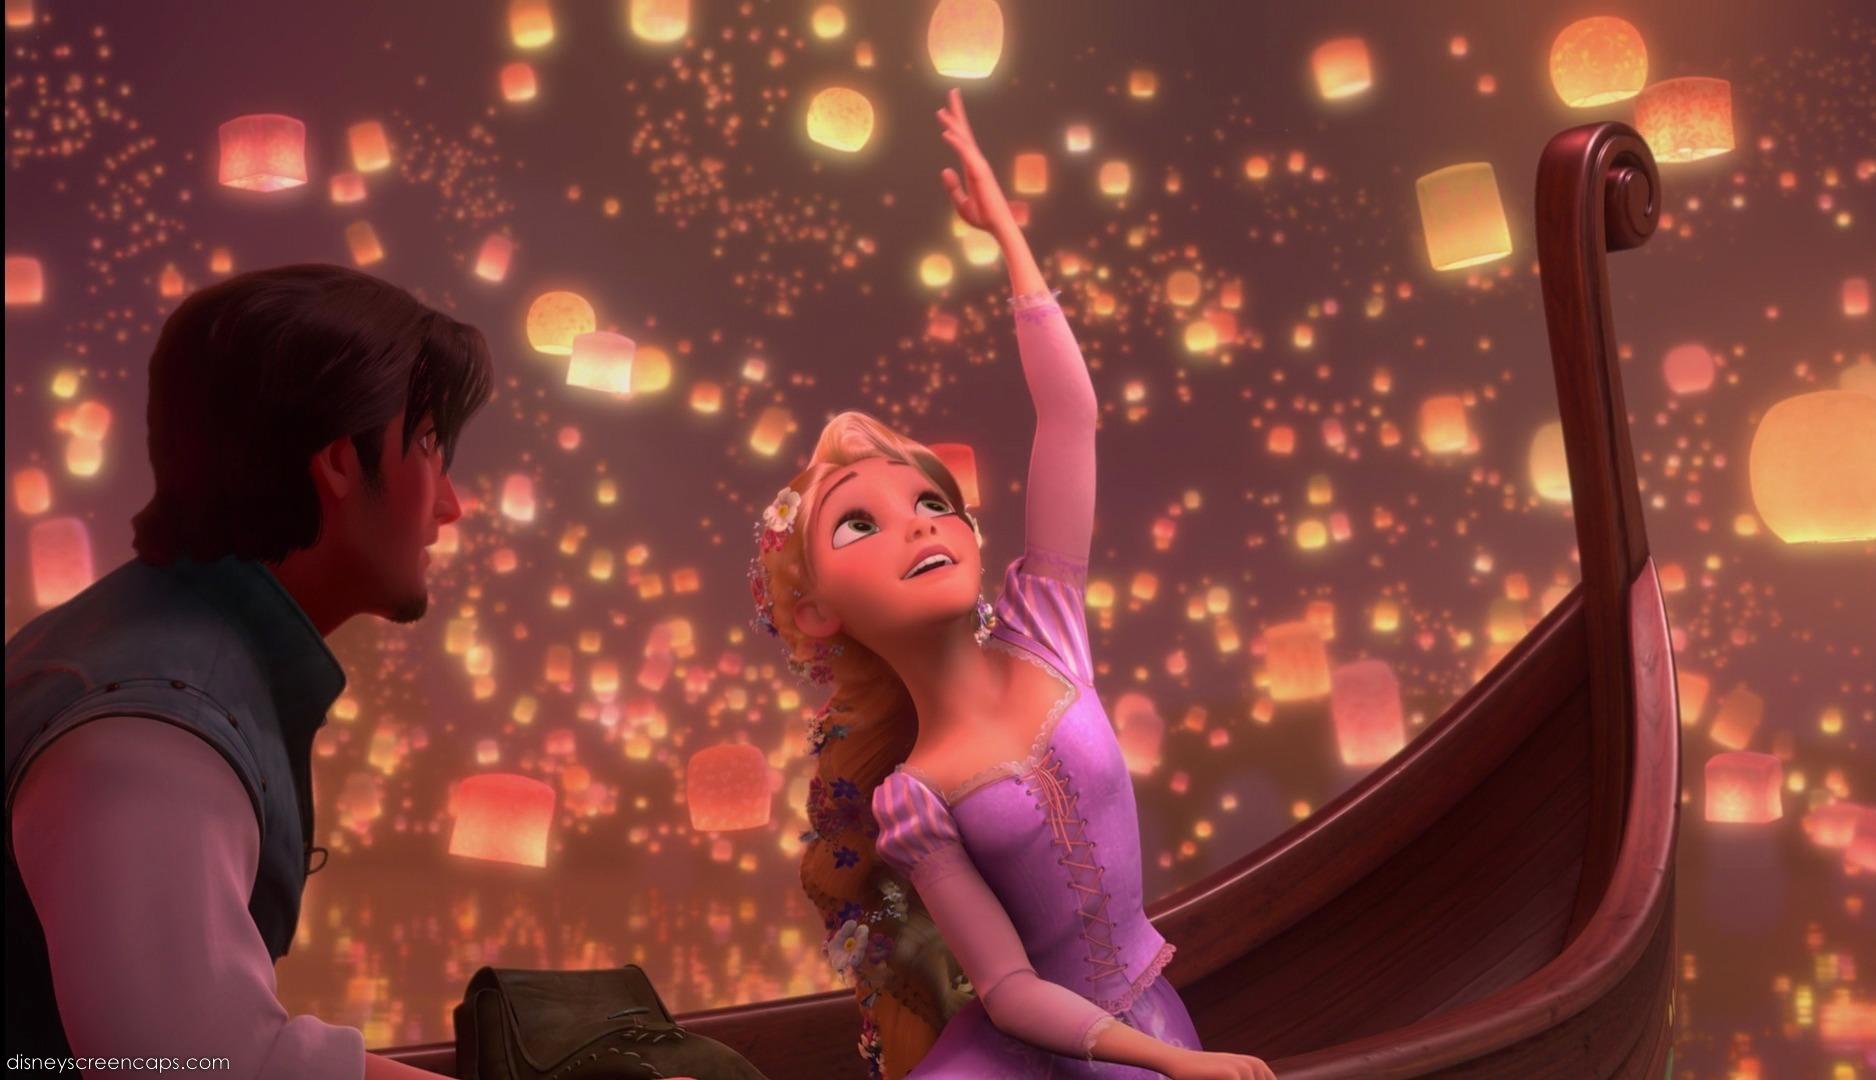 Tangled Tangled Movie 2010 screencaps